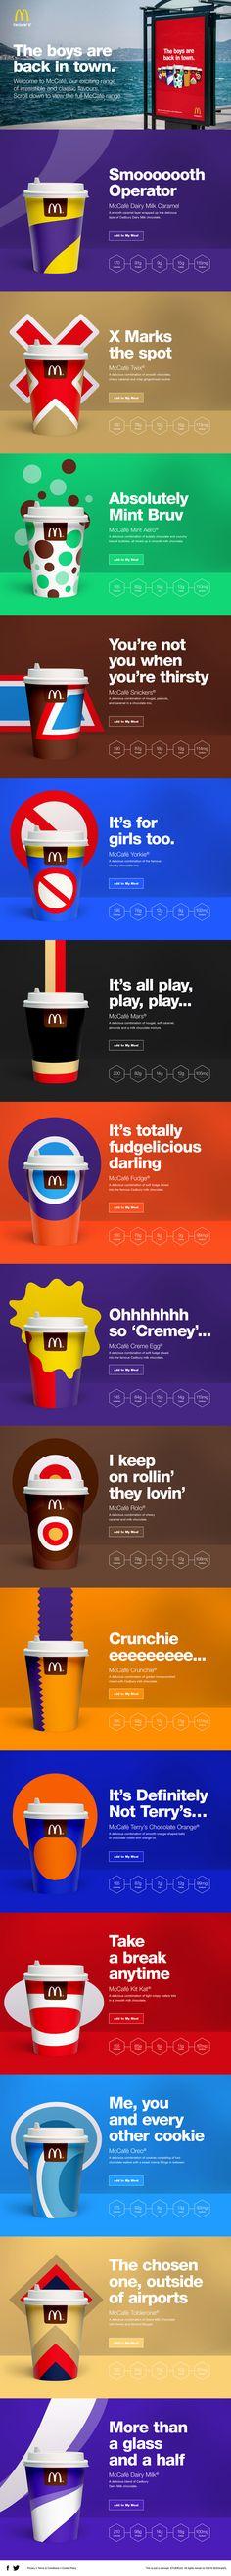 https://www.behance.net/gallery/24737201/McDonalds-The-Boys-Are-Back-in-Town